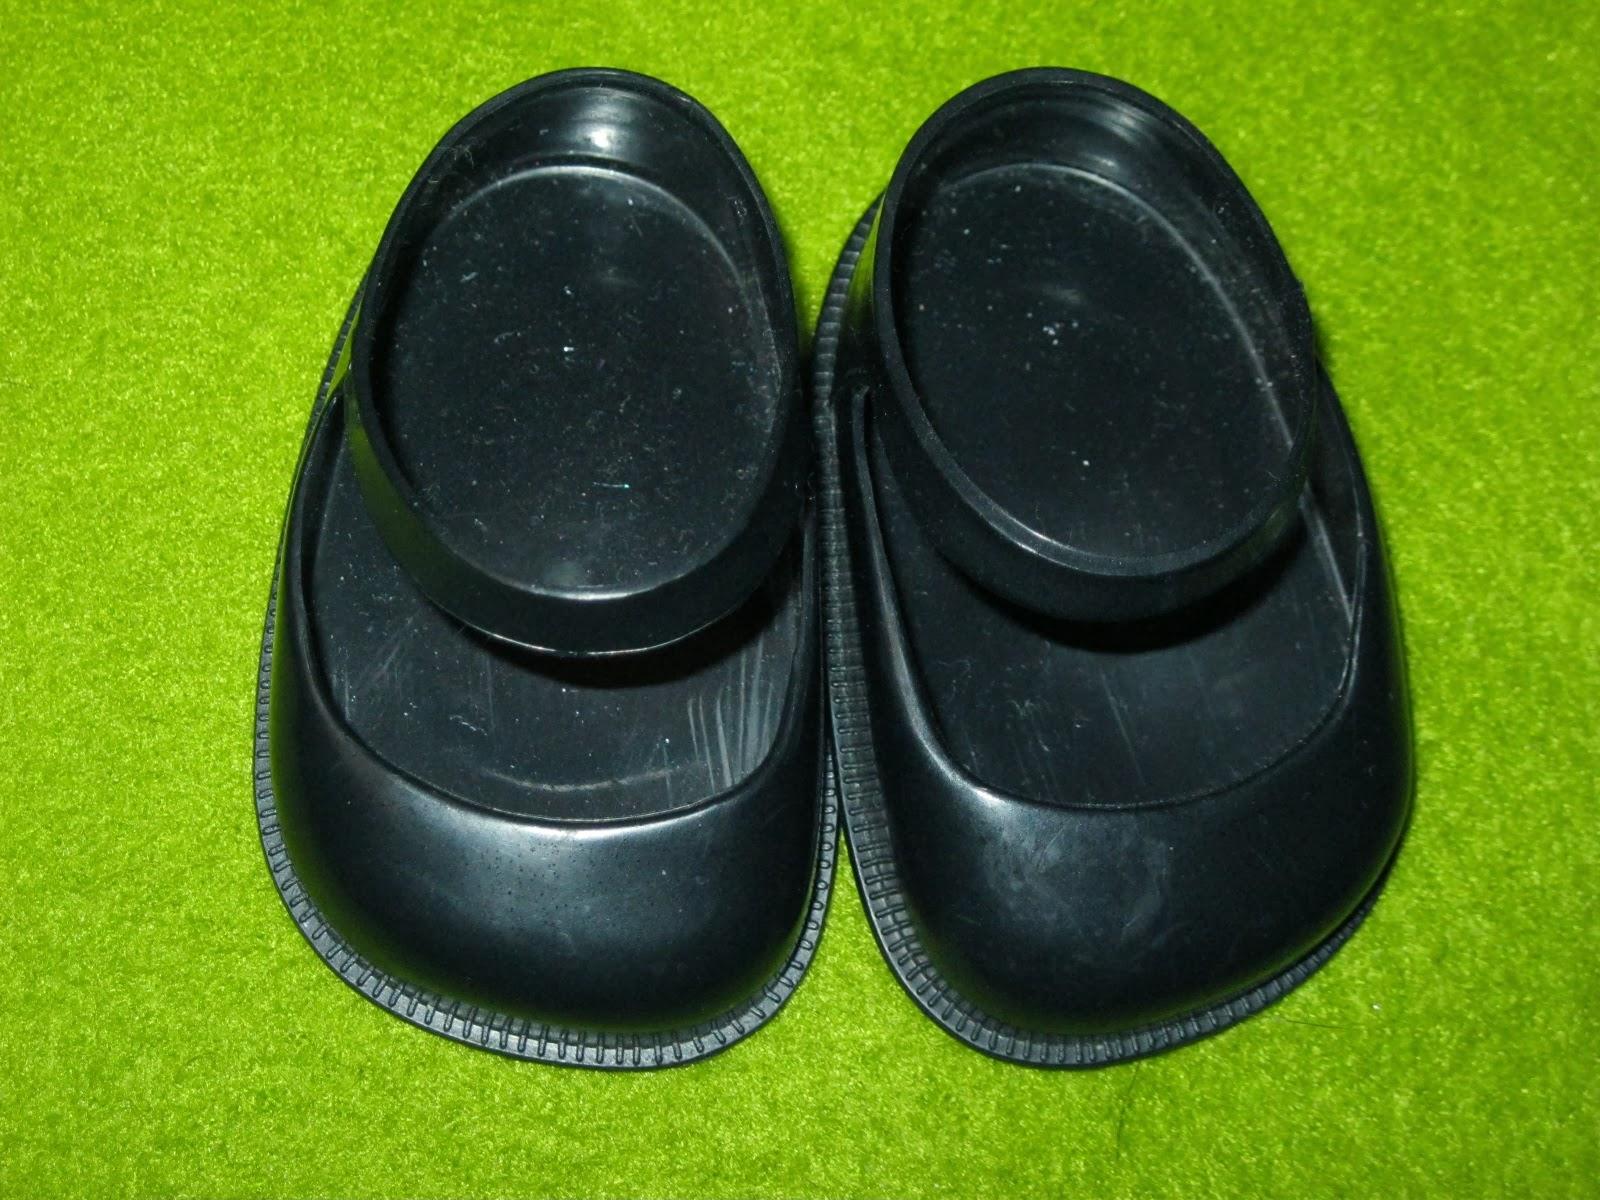 Dress Shoe Edge Clear Finish On Sole